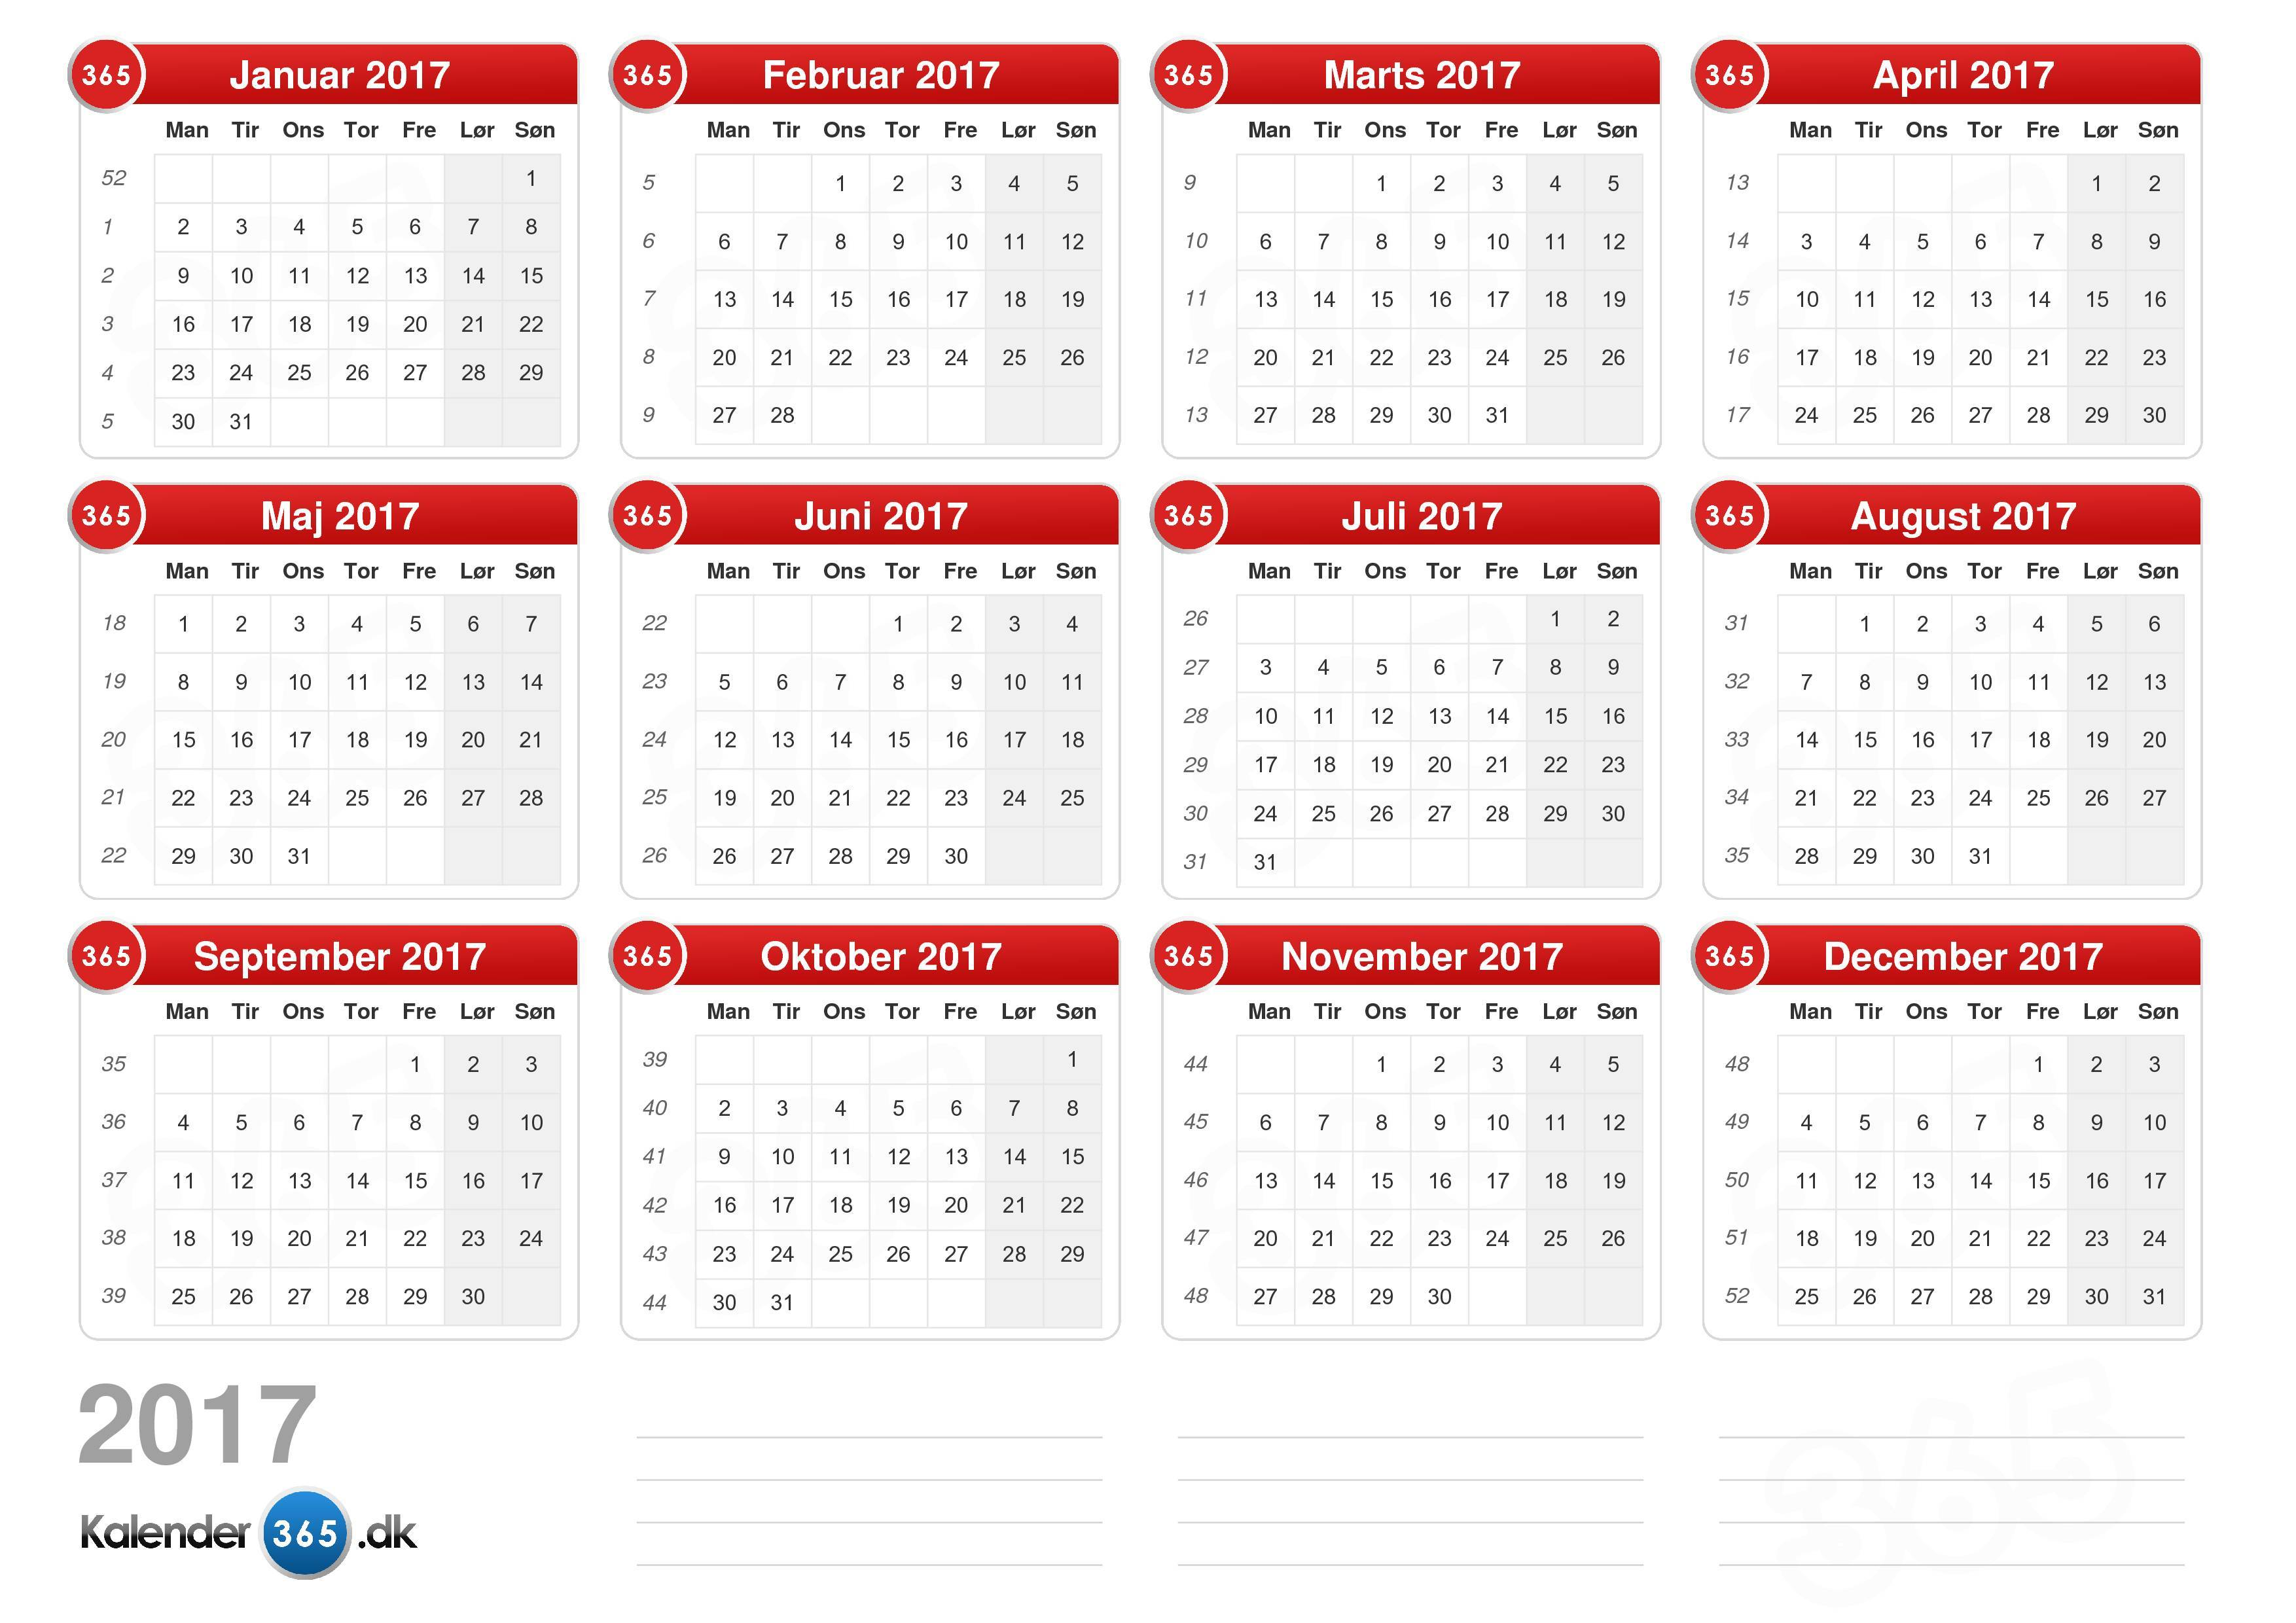 Kalender 2017 (v2)